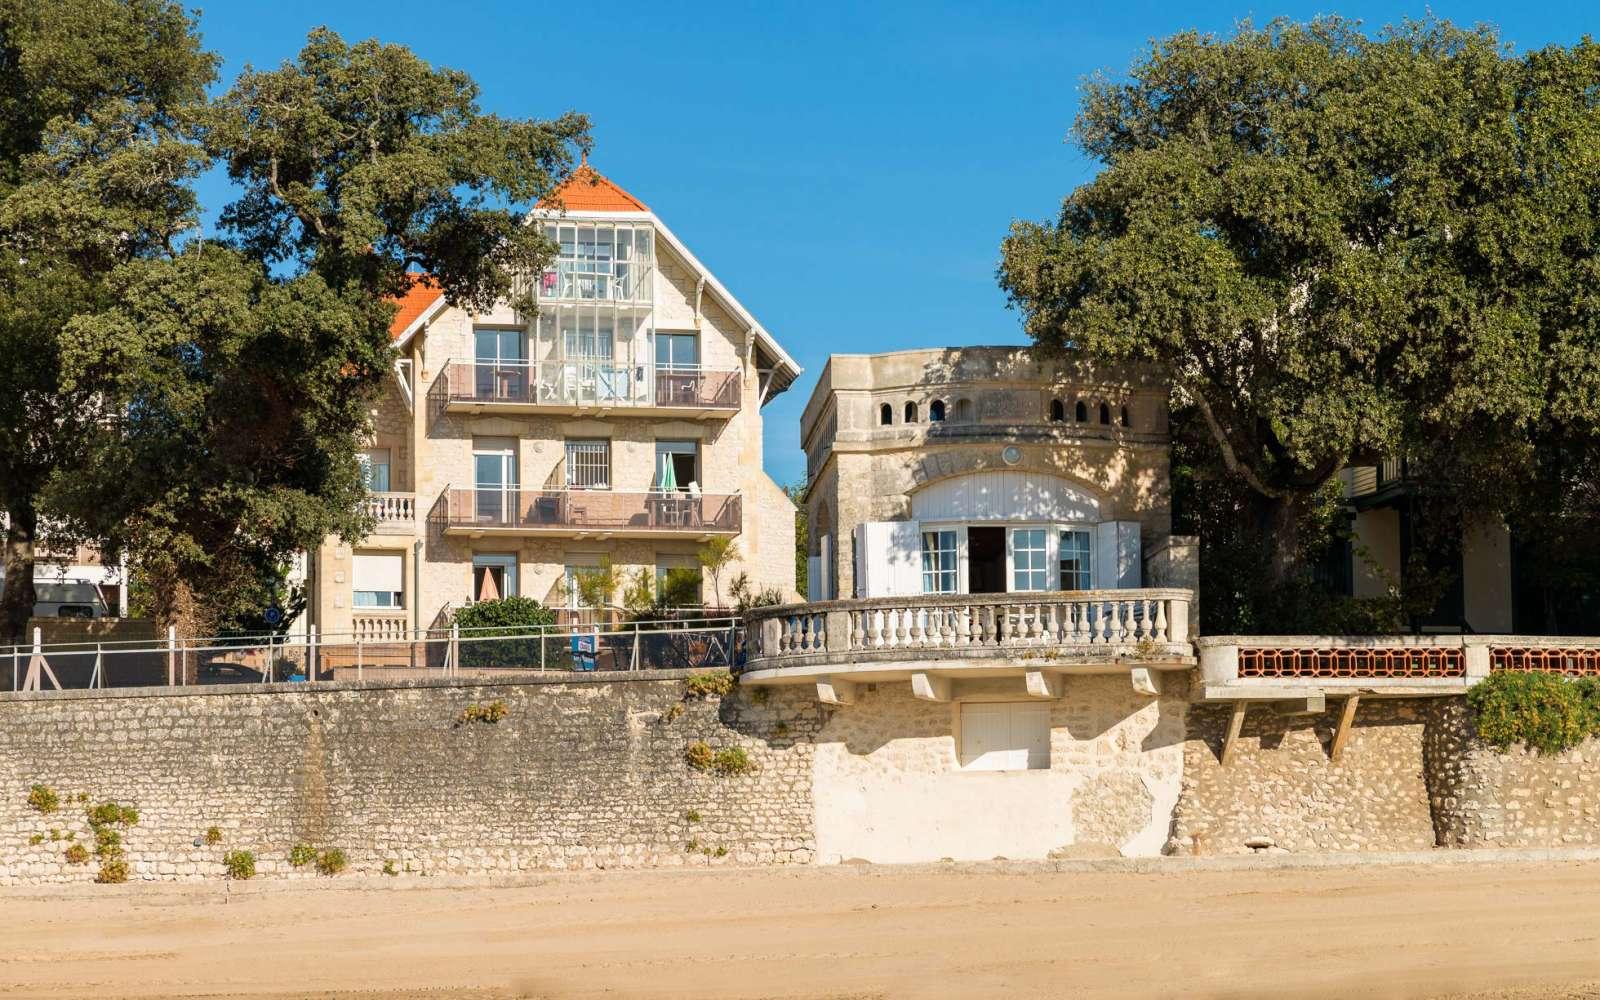 residence le phalene holiday accommodation saint palais sur mer lagrange. Black Bedroom Furniture Sets. Home Design Ideas